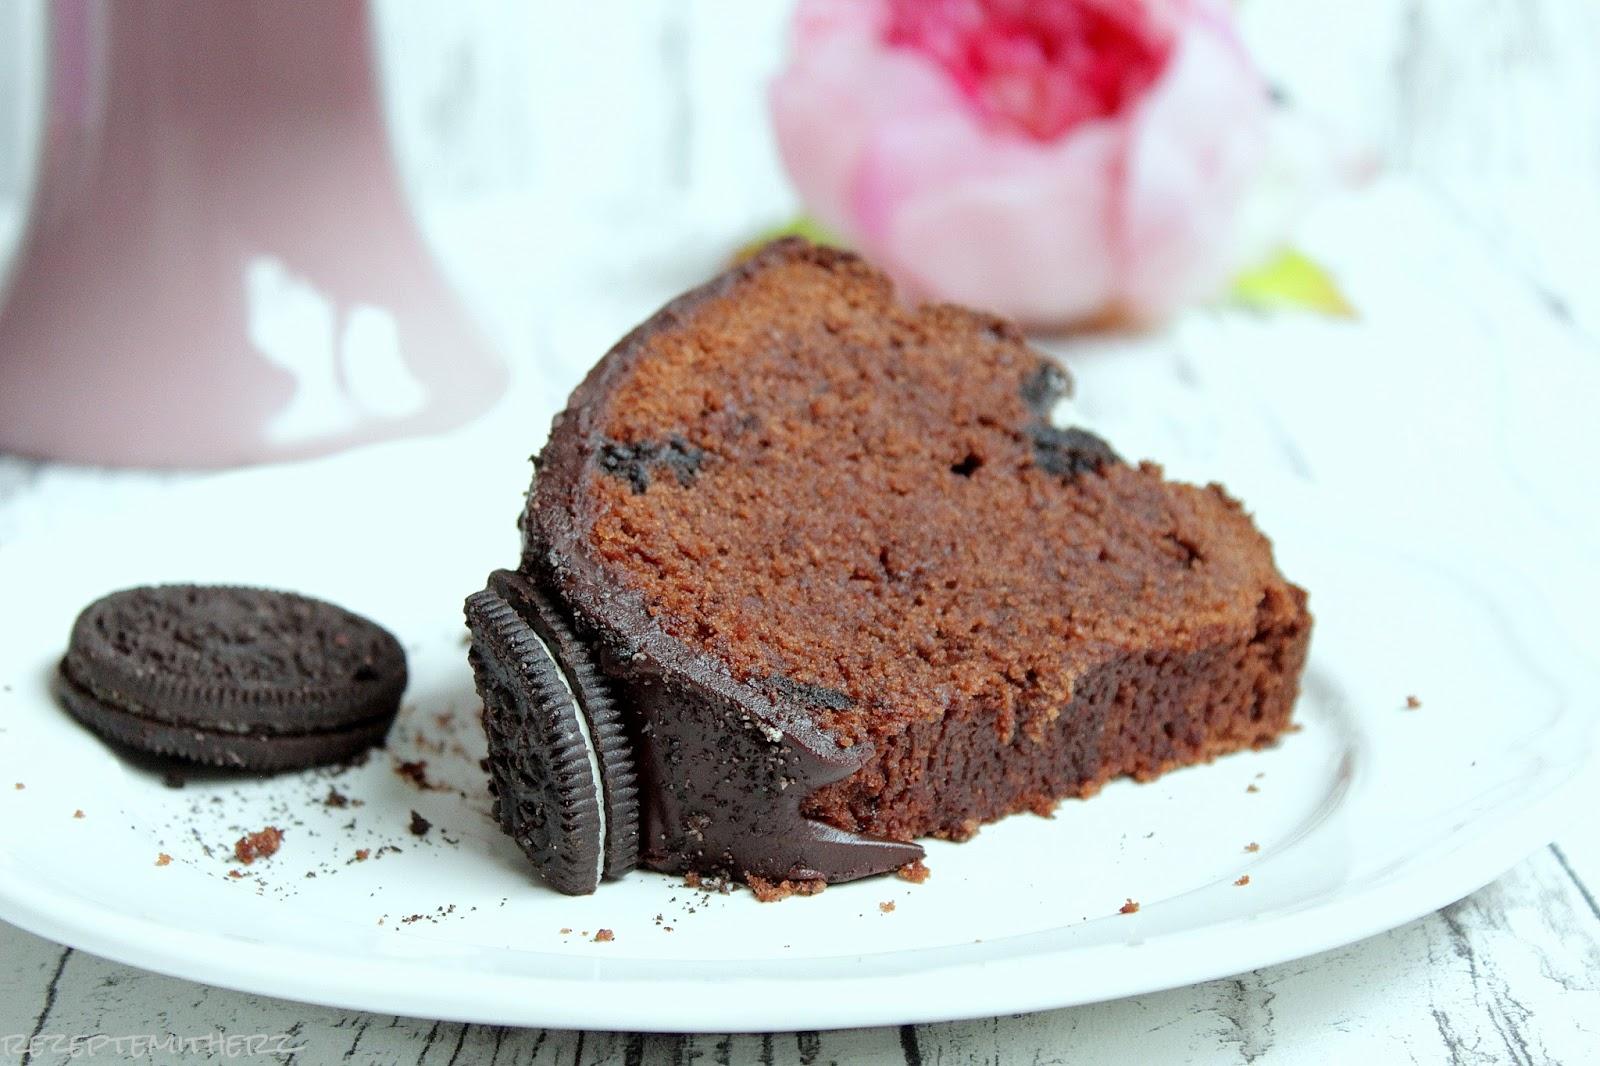 Pampered Chef Oreo Bundt Cake